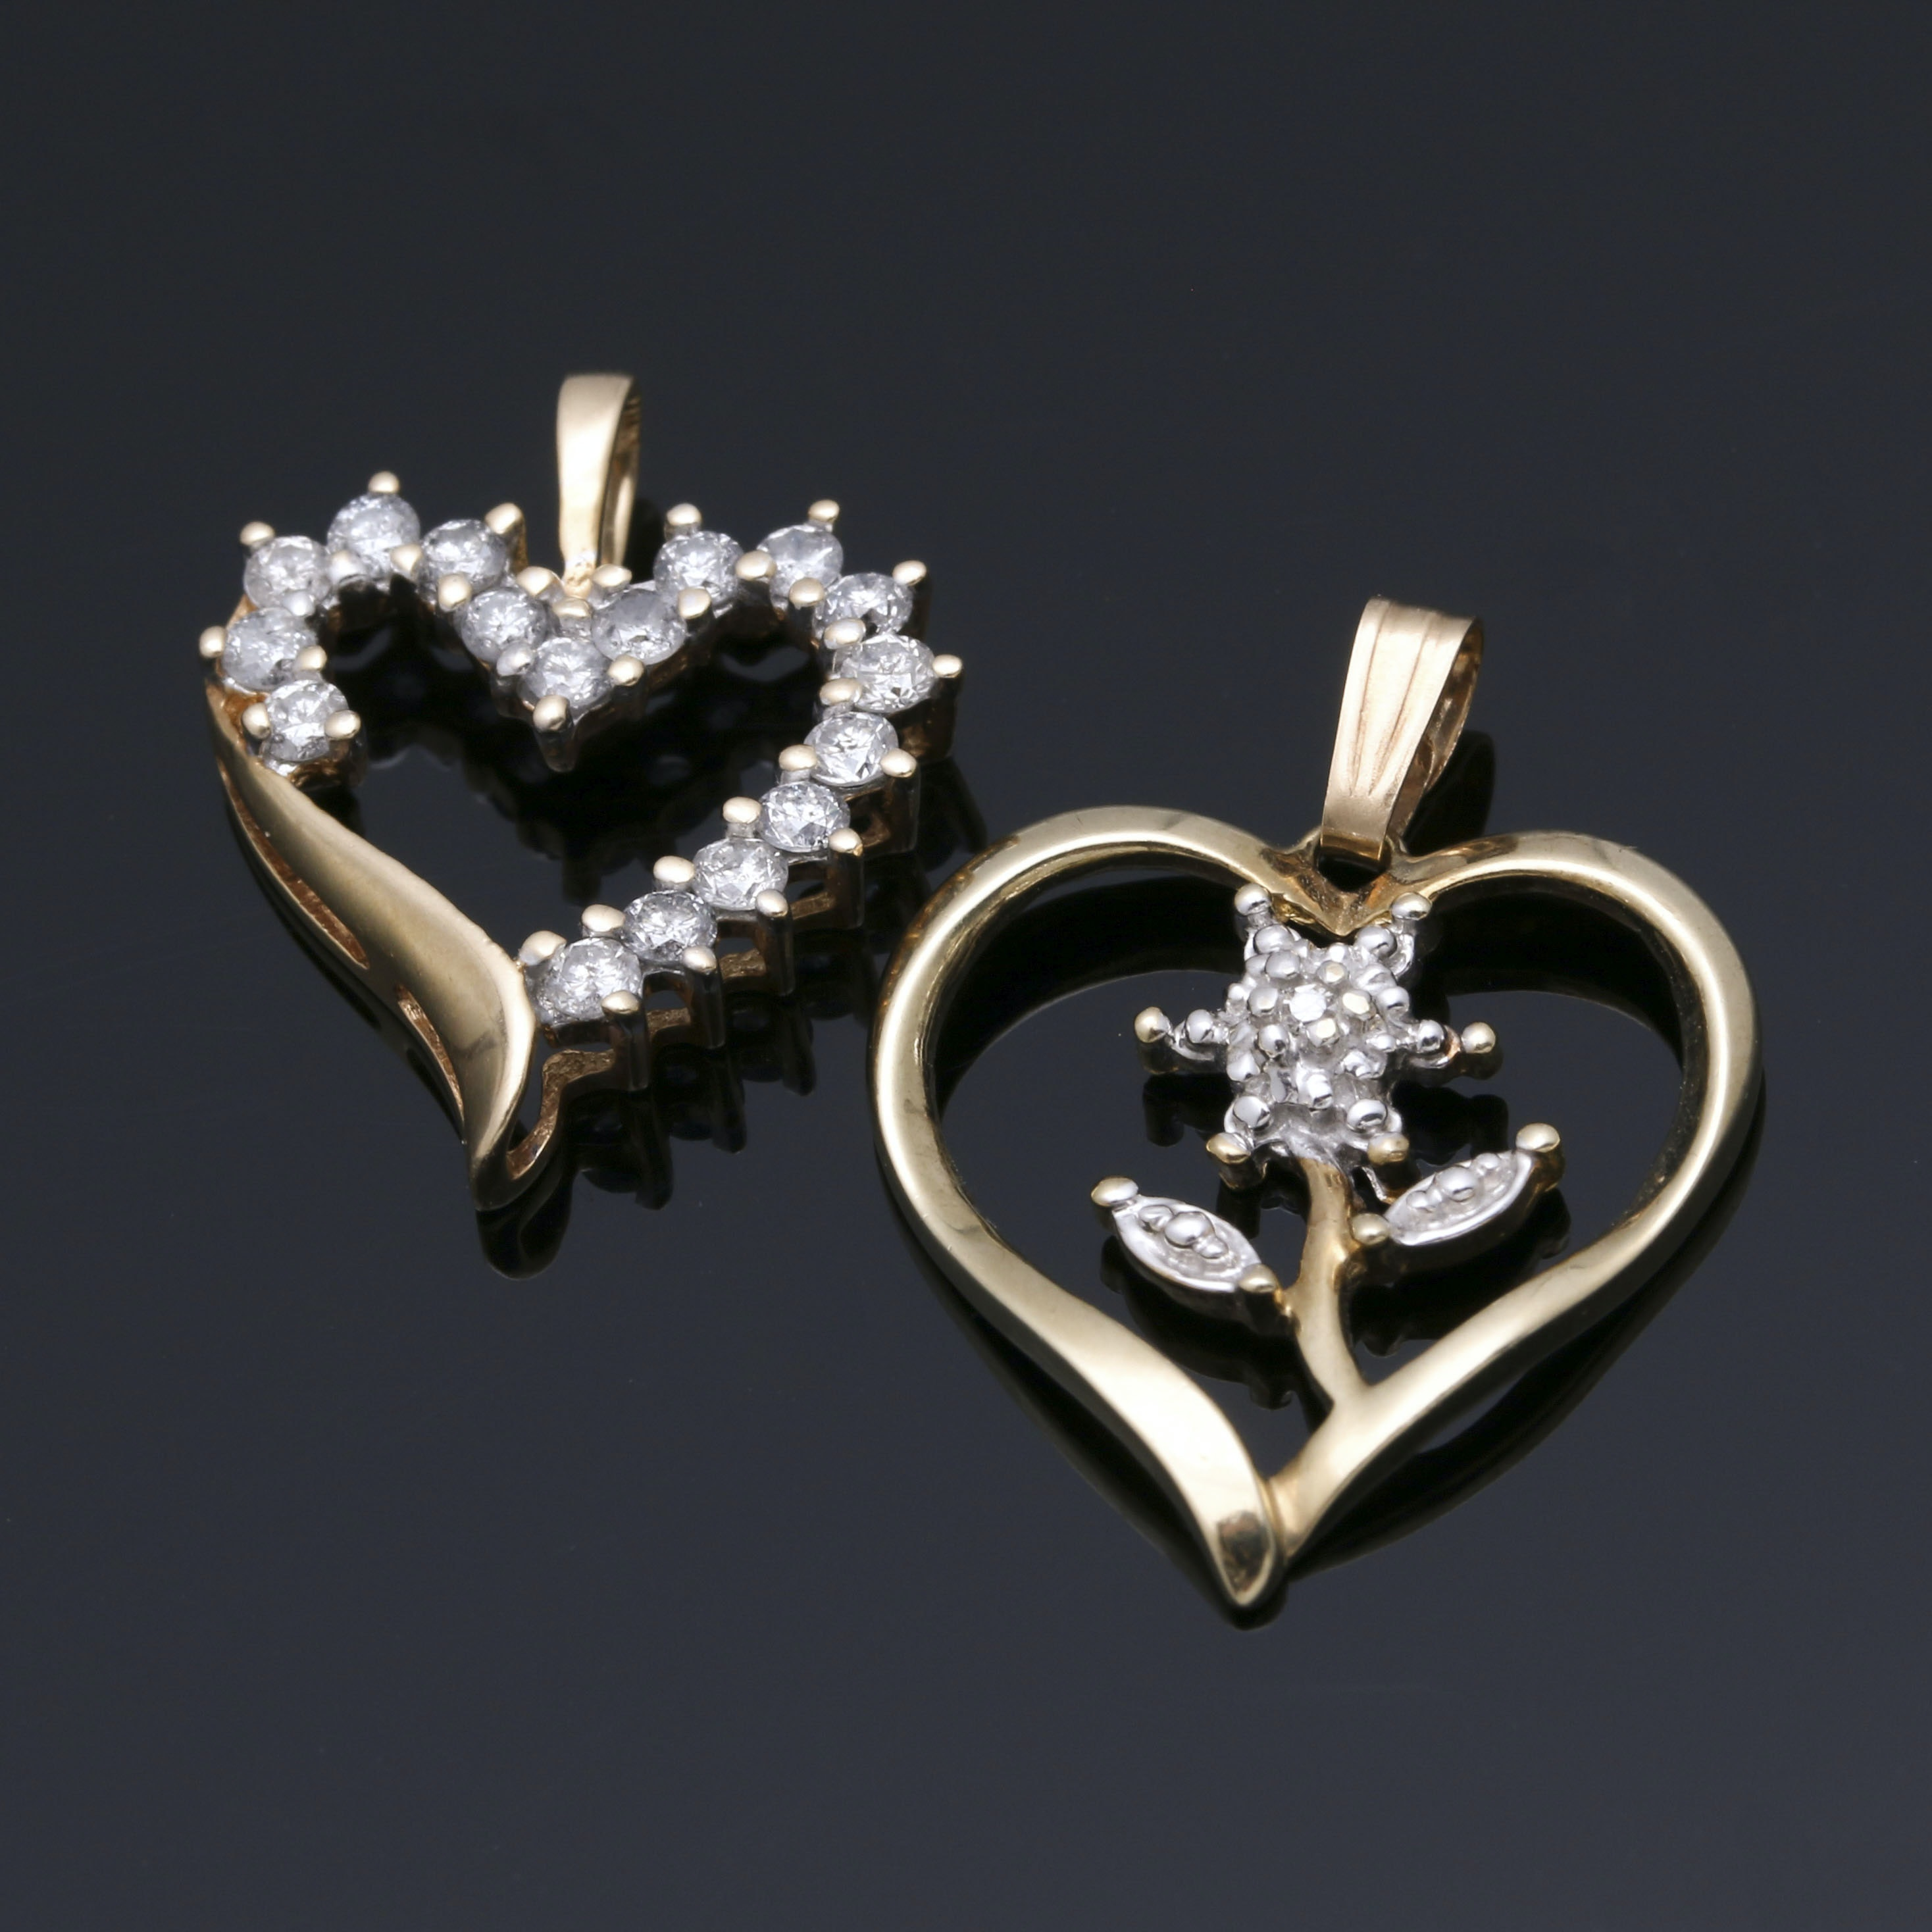 14K and 10K Yellow Gold Diamond Heart Pendants